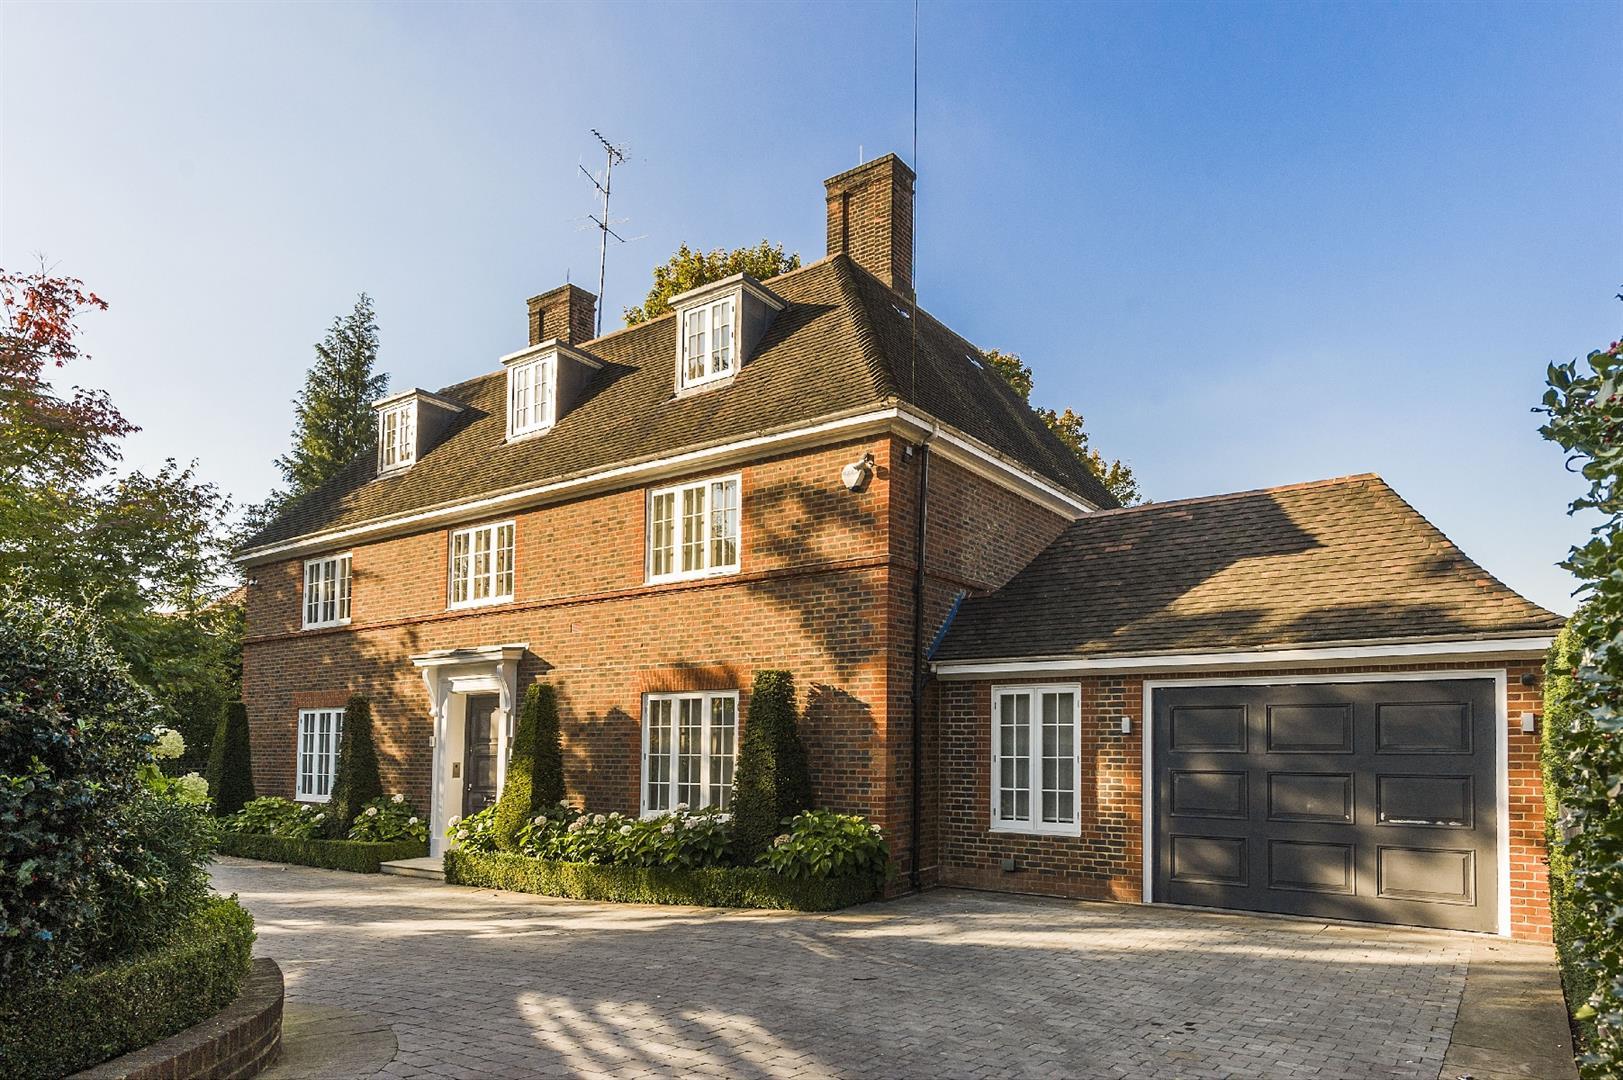 6 Bedroom Property For Sale In Ingram Avenue Hampstead